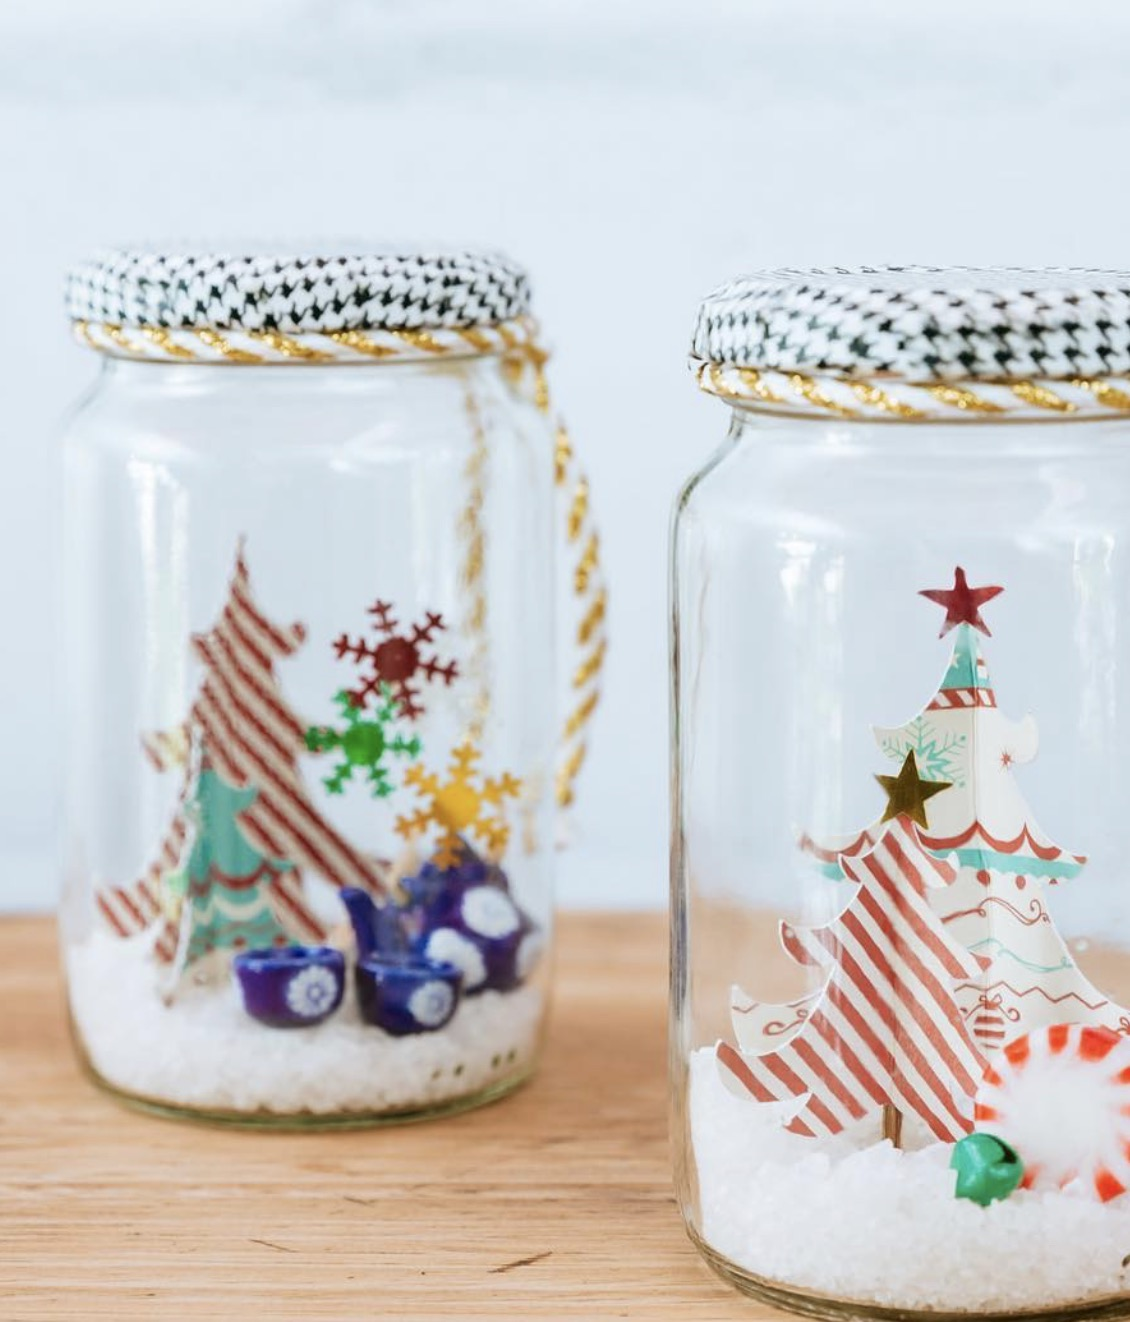 Christmas snow globe terrariums in jars